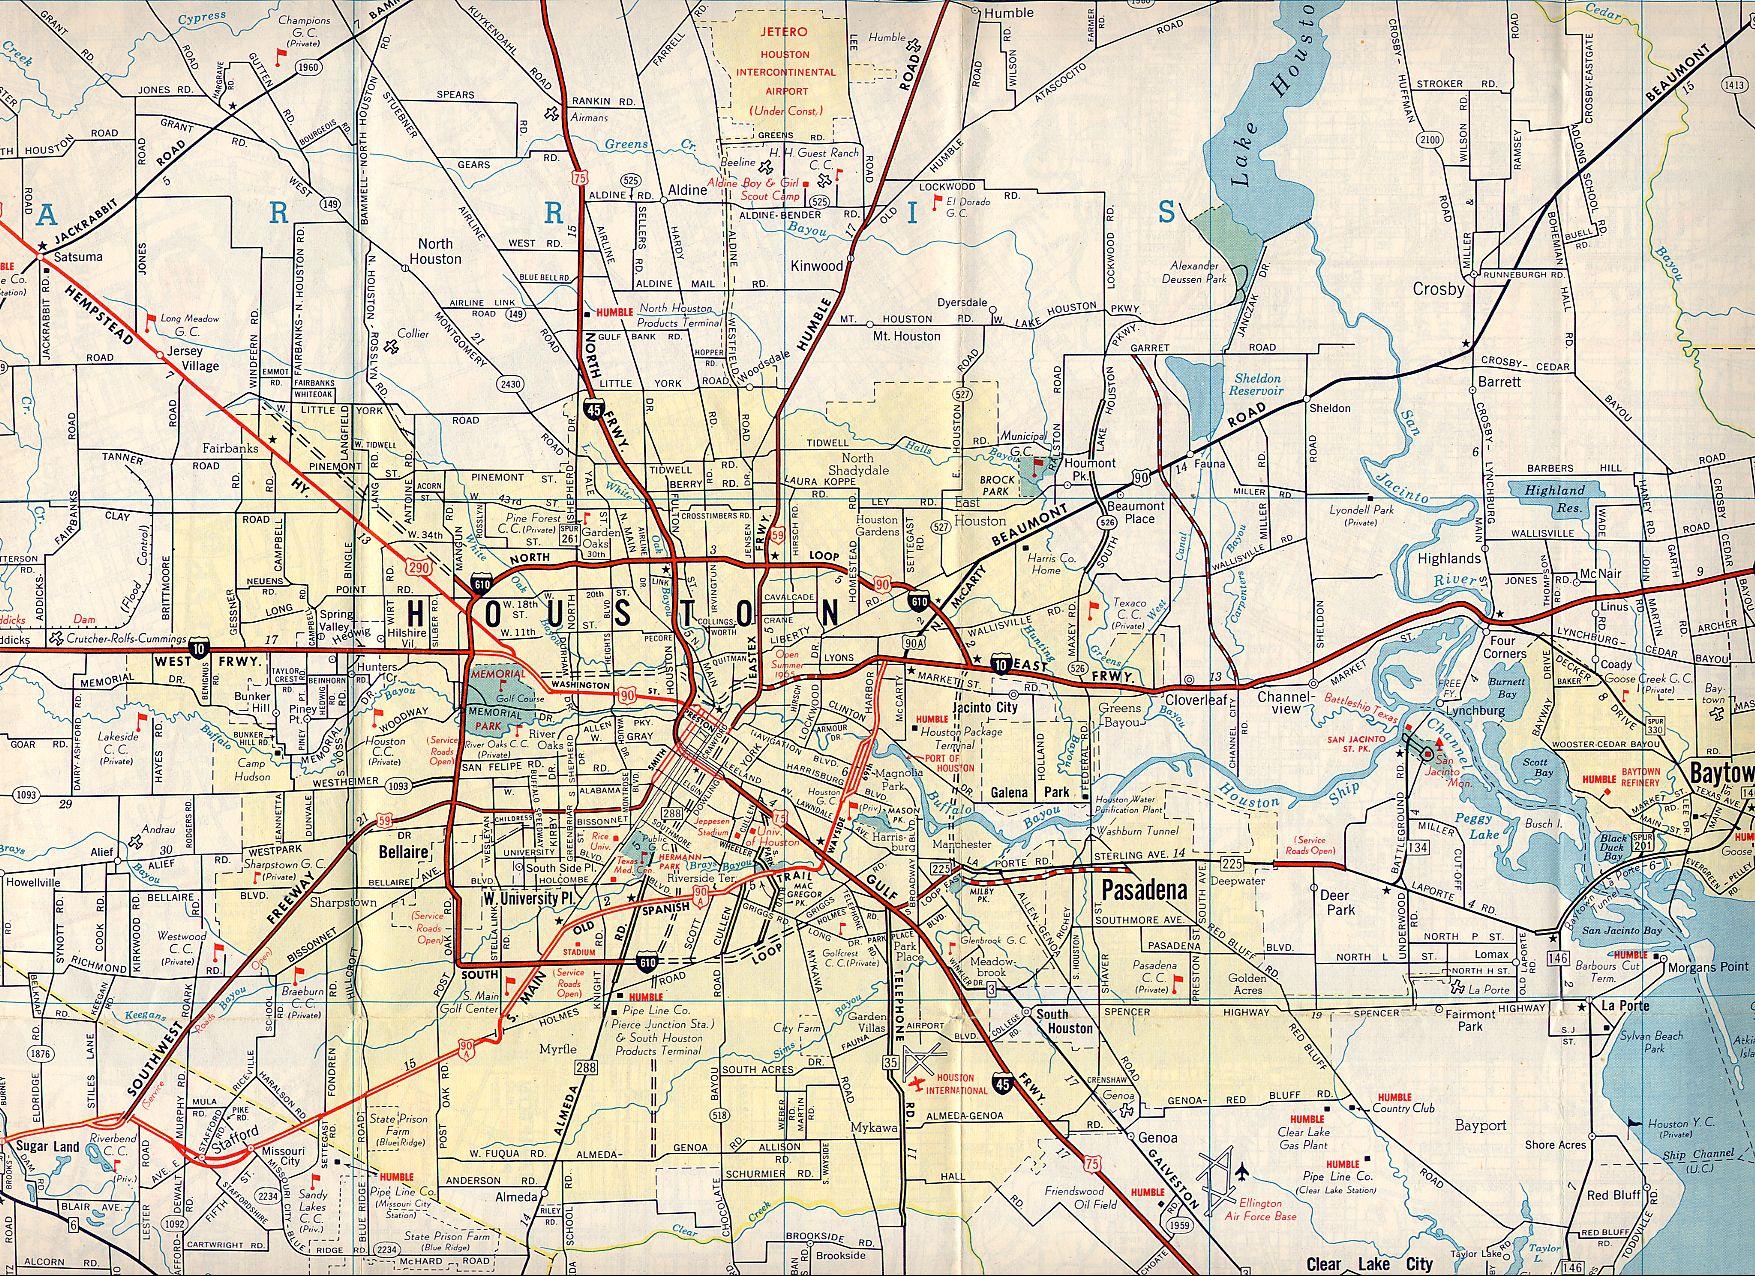 Us Google Rail Map Old Houston Maps | Travel Maps And Major Tourist - Texas Road Map Google